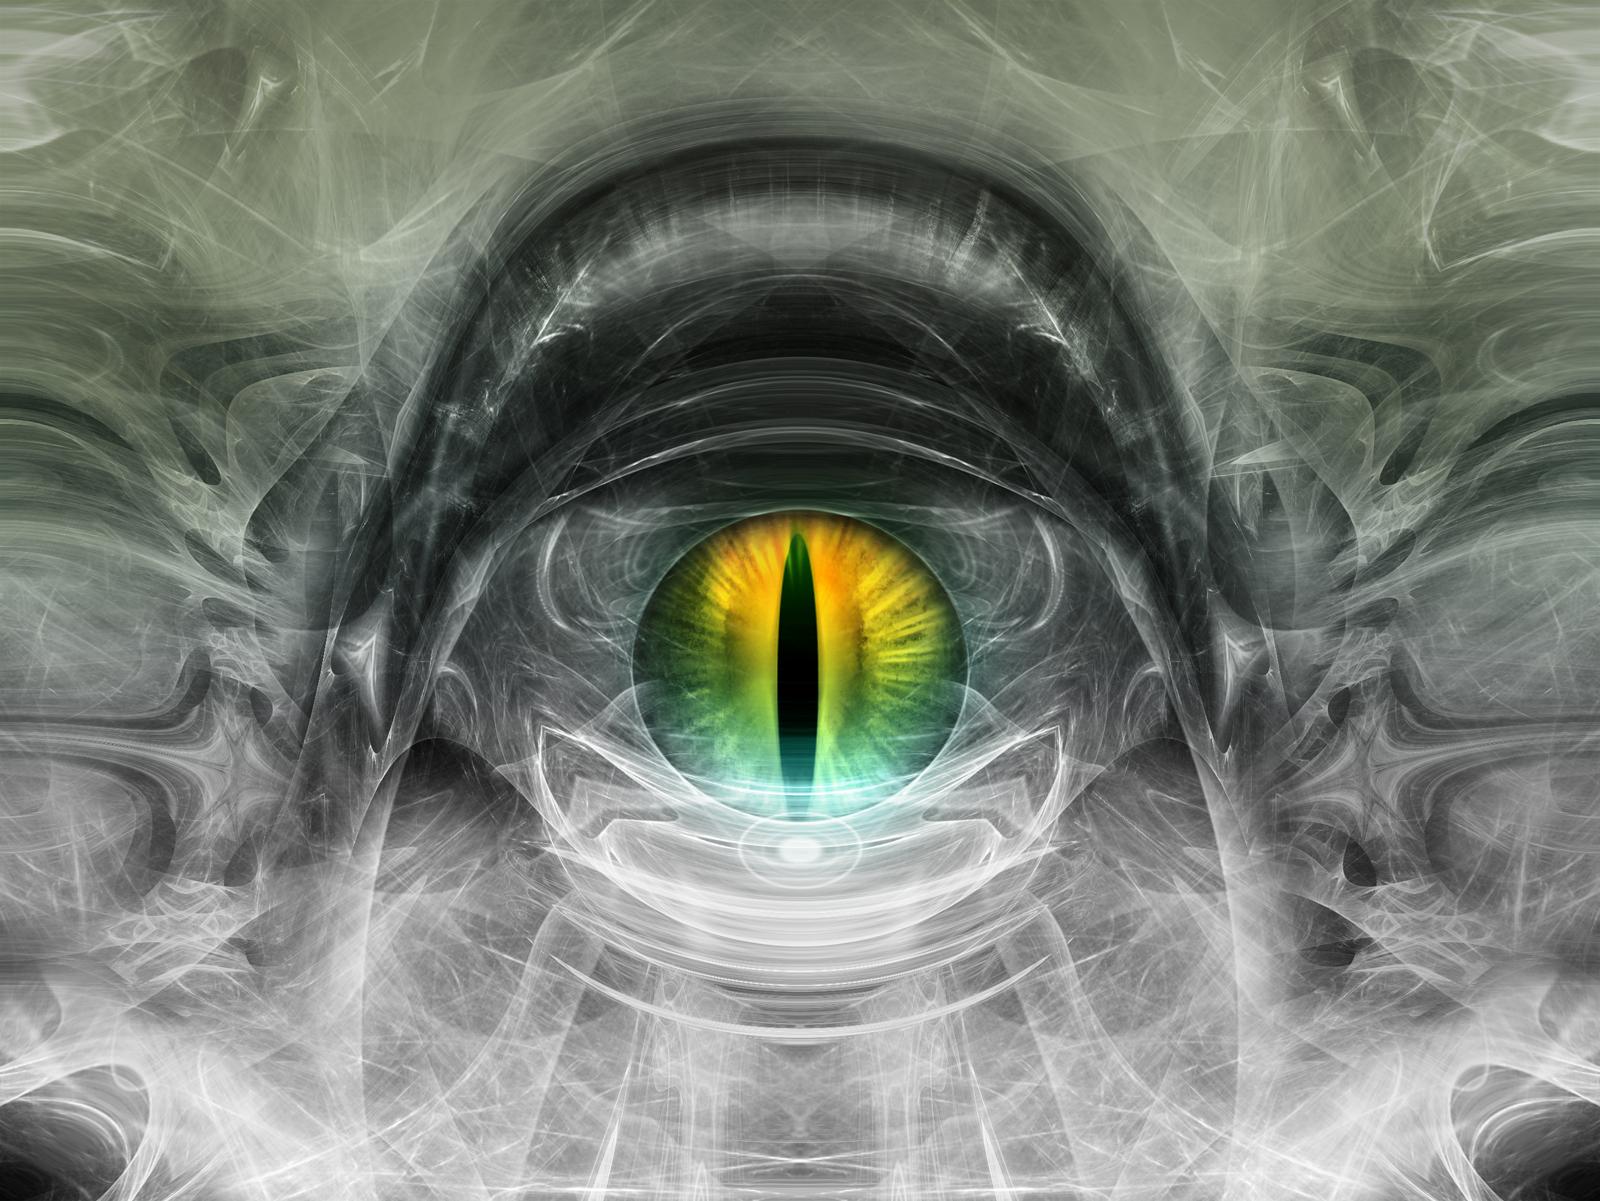 La Infección Espiritual a través de la Falsa Luz.  5905_1_miscellaneous_digital_art_hd_wallpapers_eyes